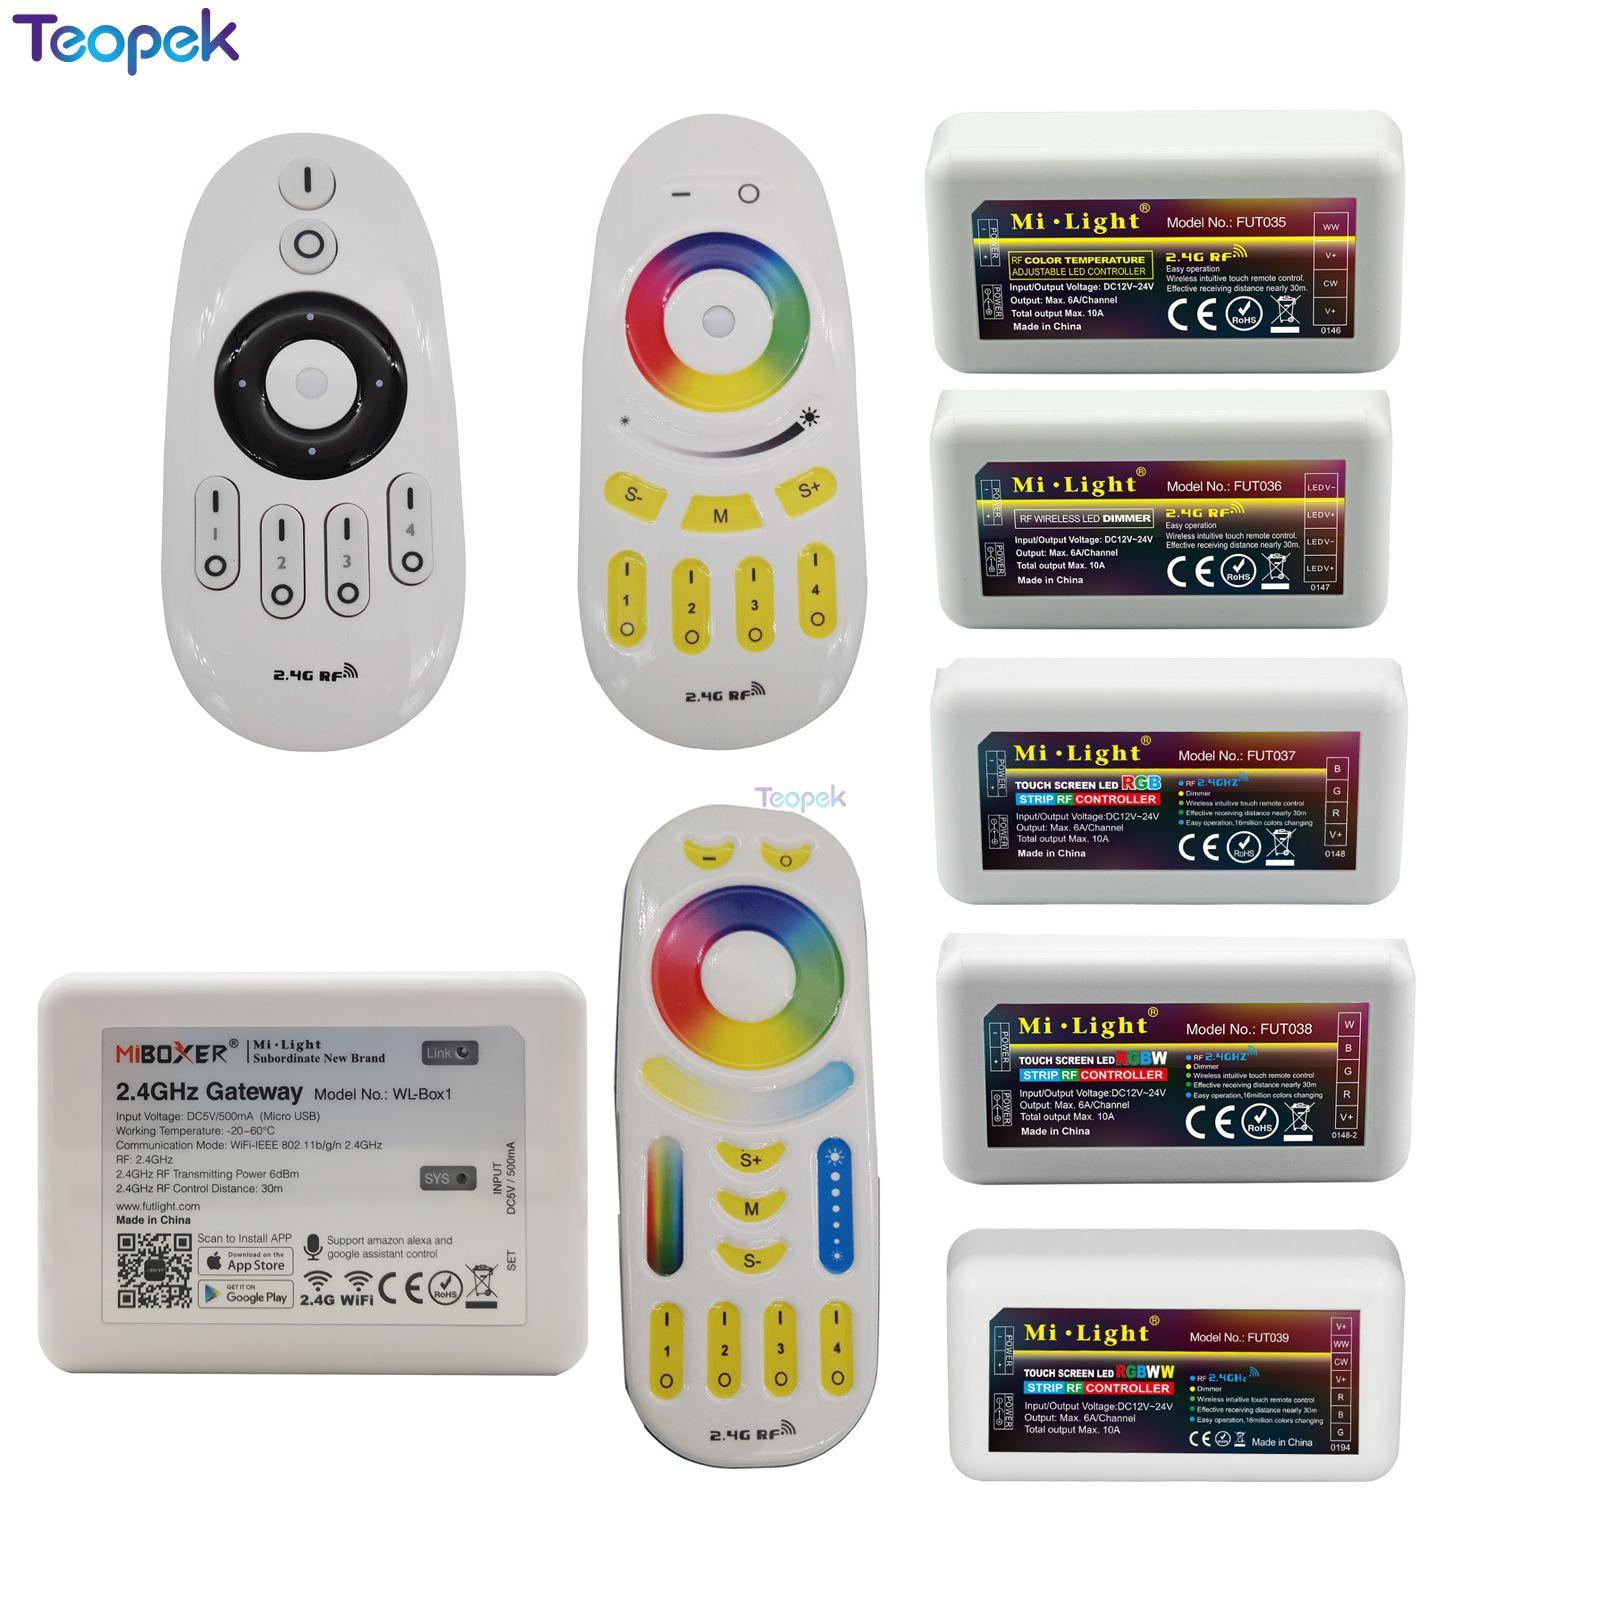 Mi.Light Wireless Controller 2.4G RF Remote Control / WiFi APP Control For Single Color / RGBW / RGB / Dual White LED Strip